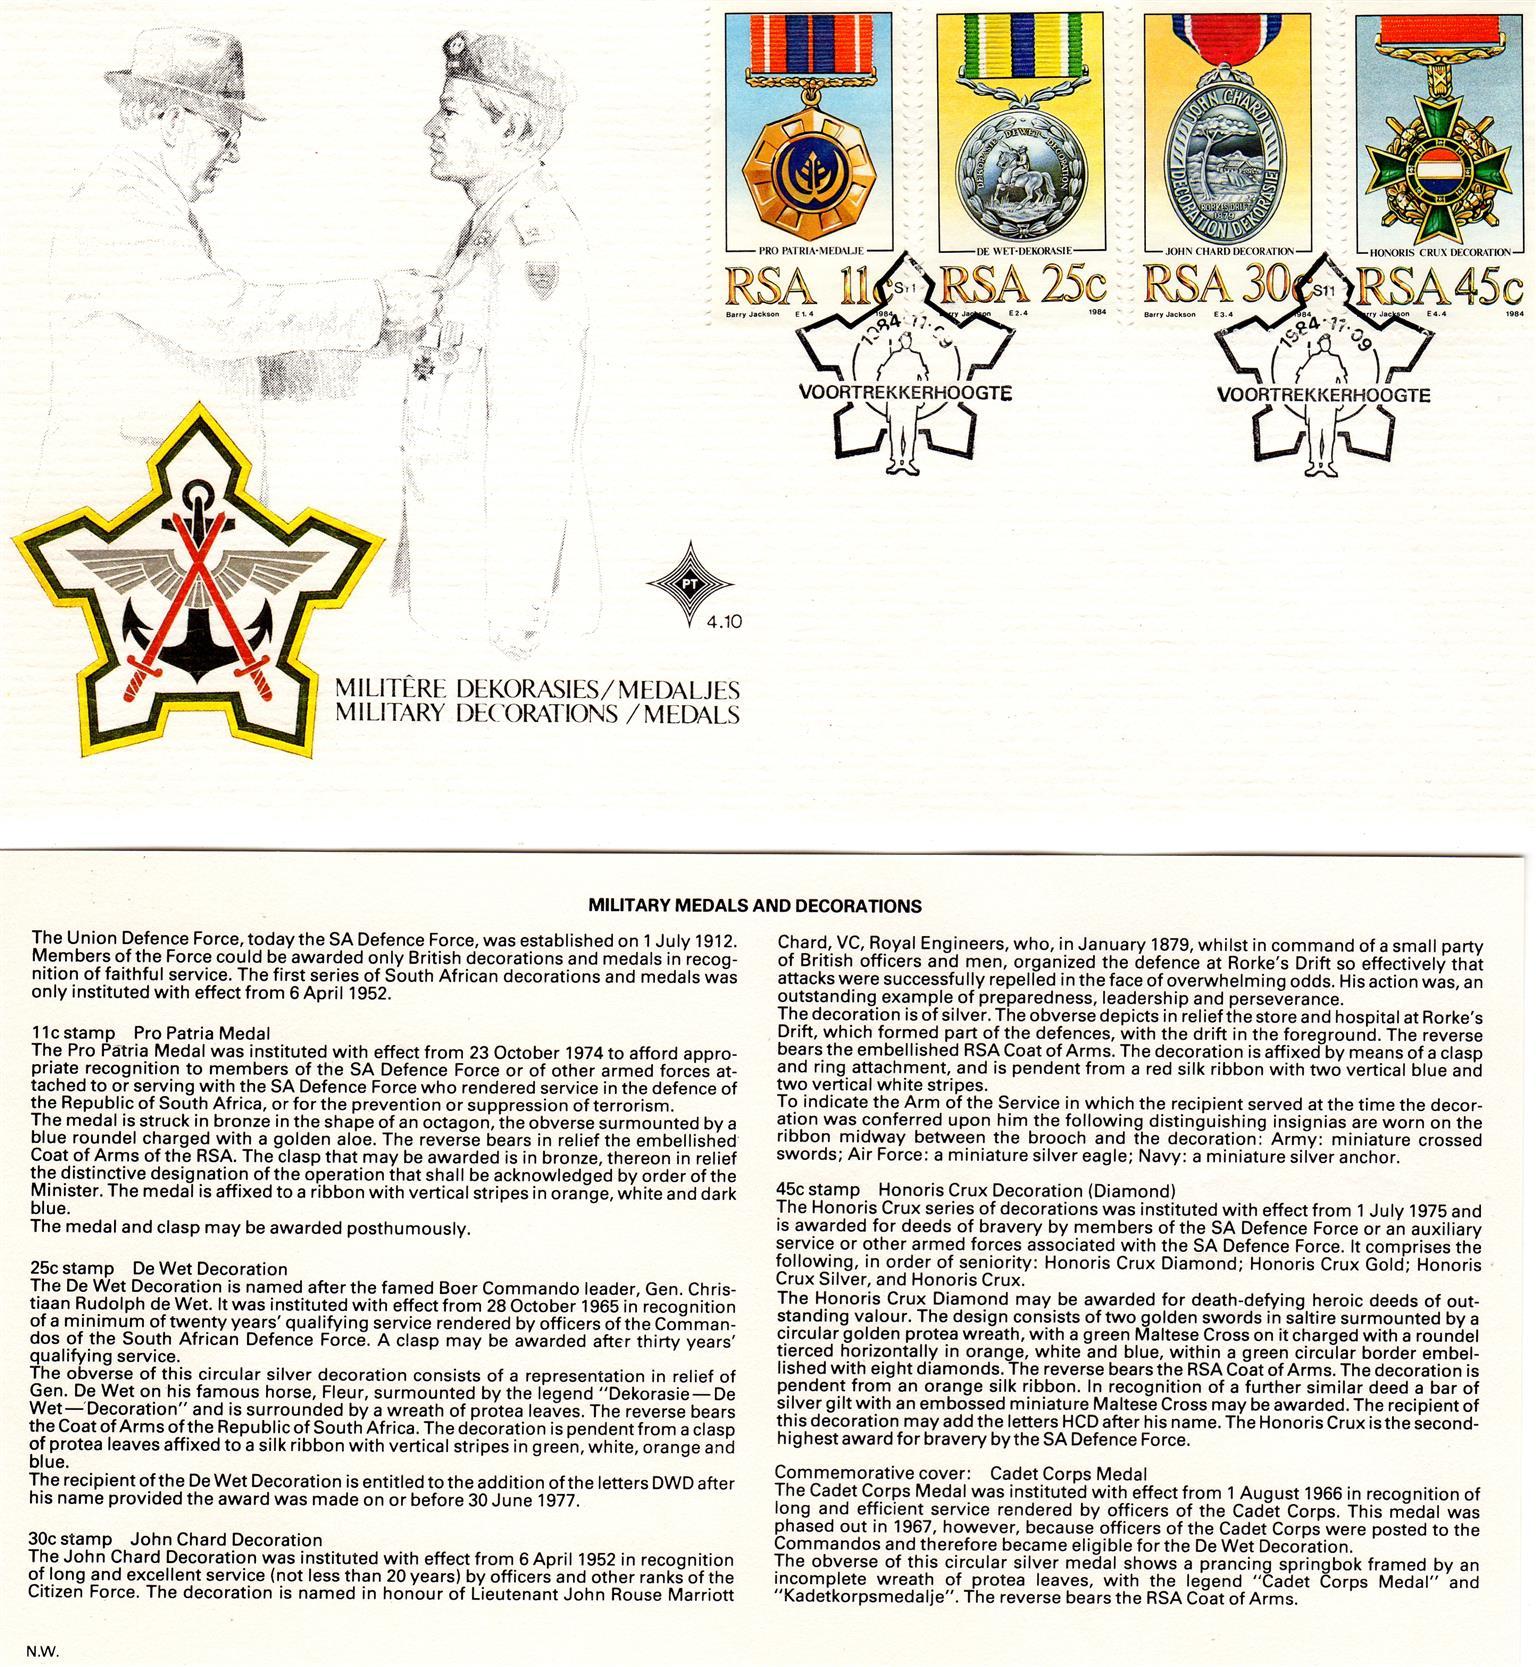 Commemorative Stamp & Envelope Set - Military Decorations/Medals 1984